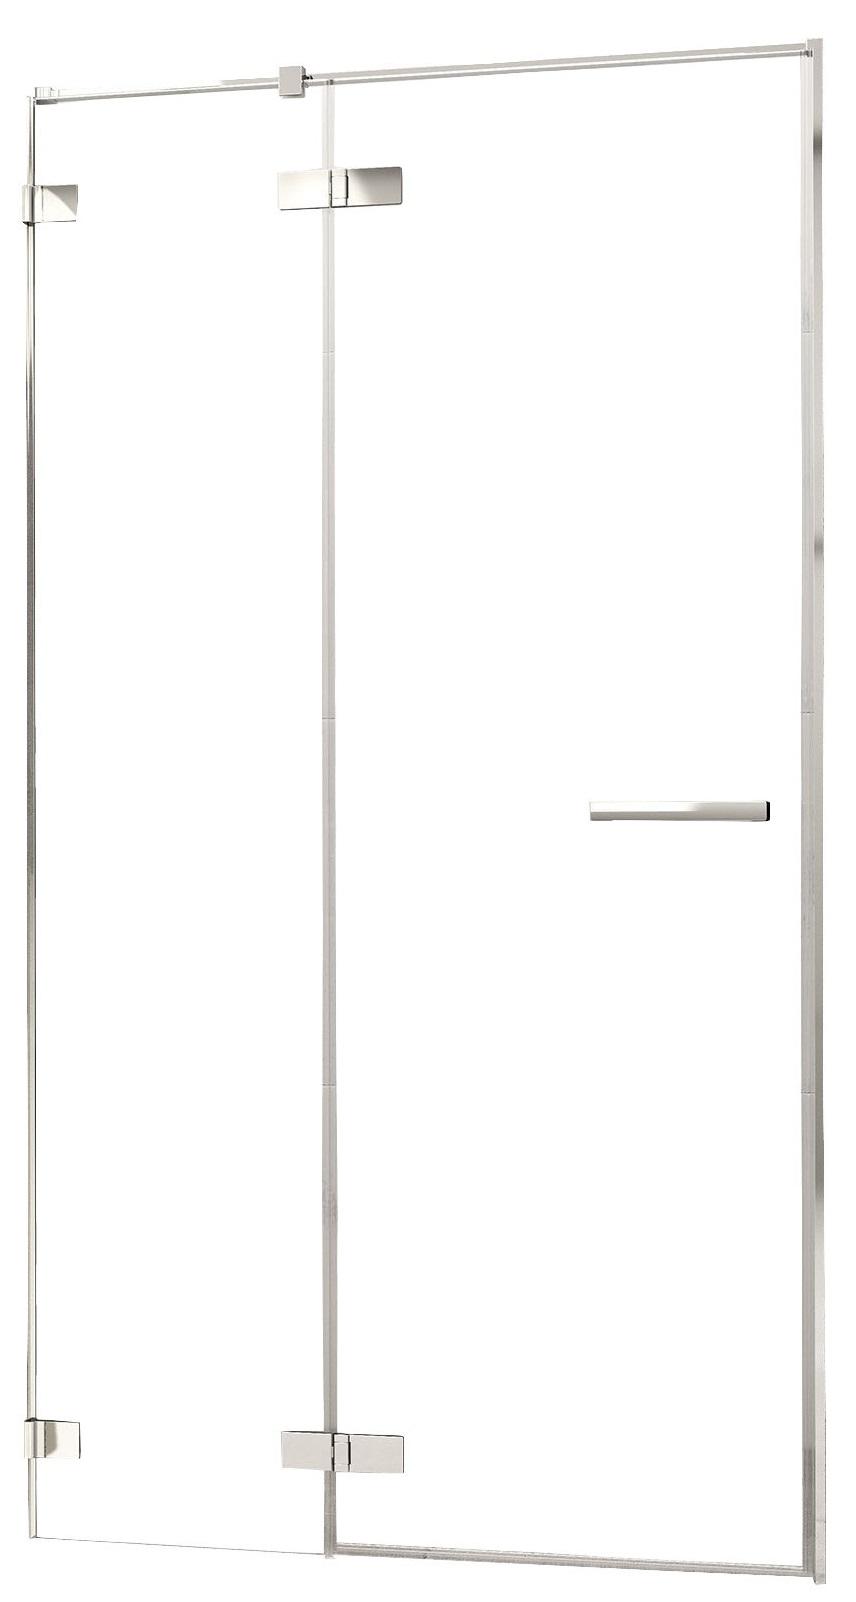 Sprchové dvere kupé Umenia II DWJ 90 RADAWAY